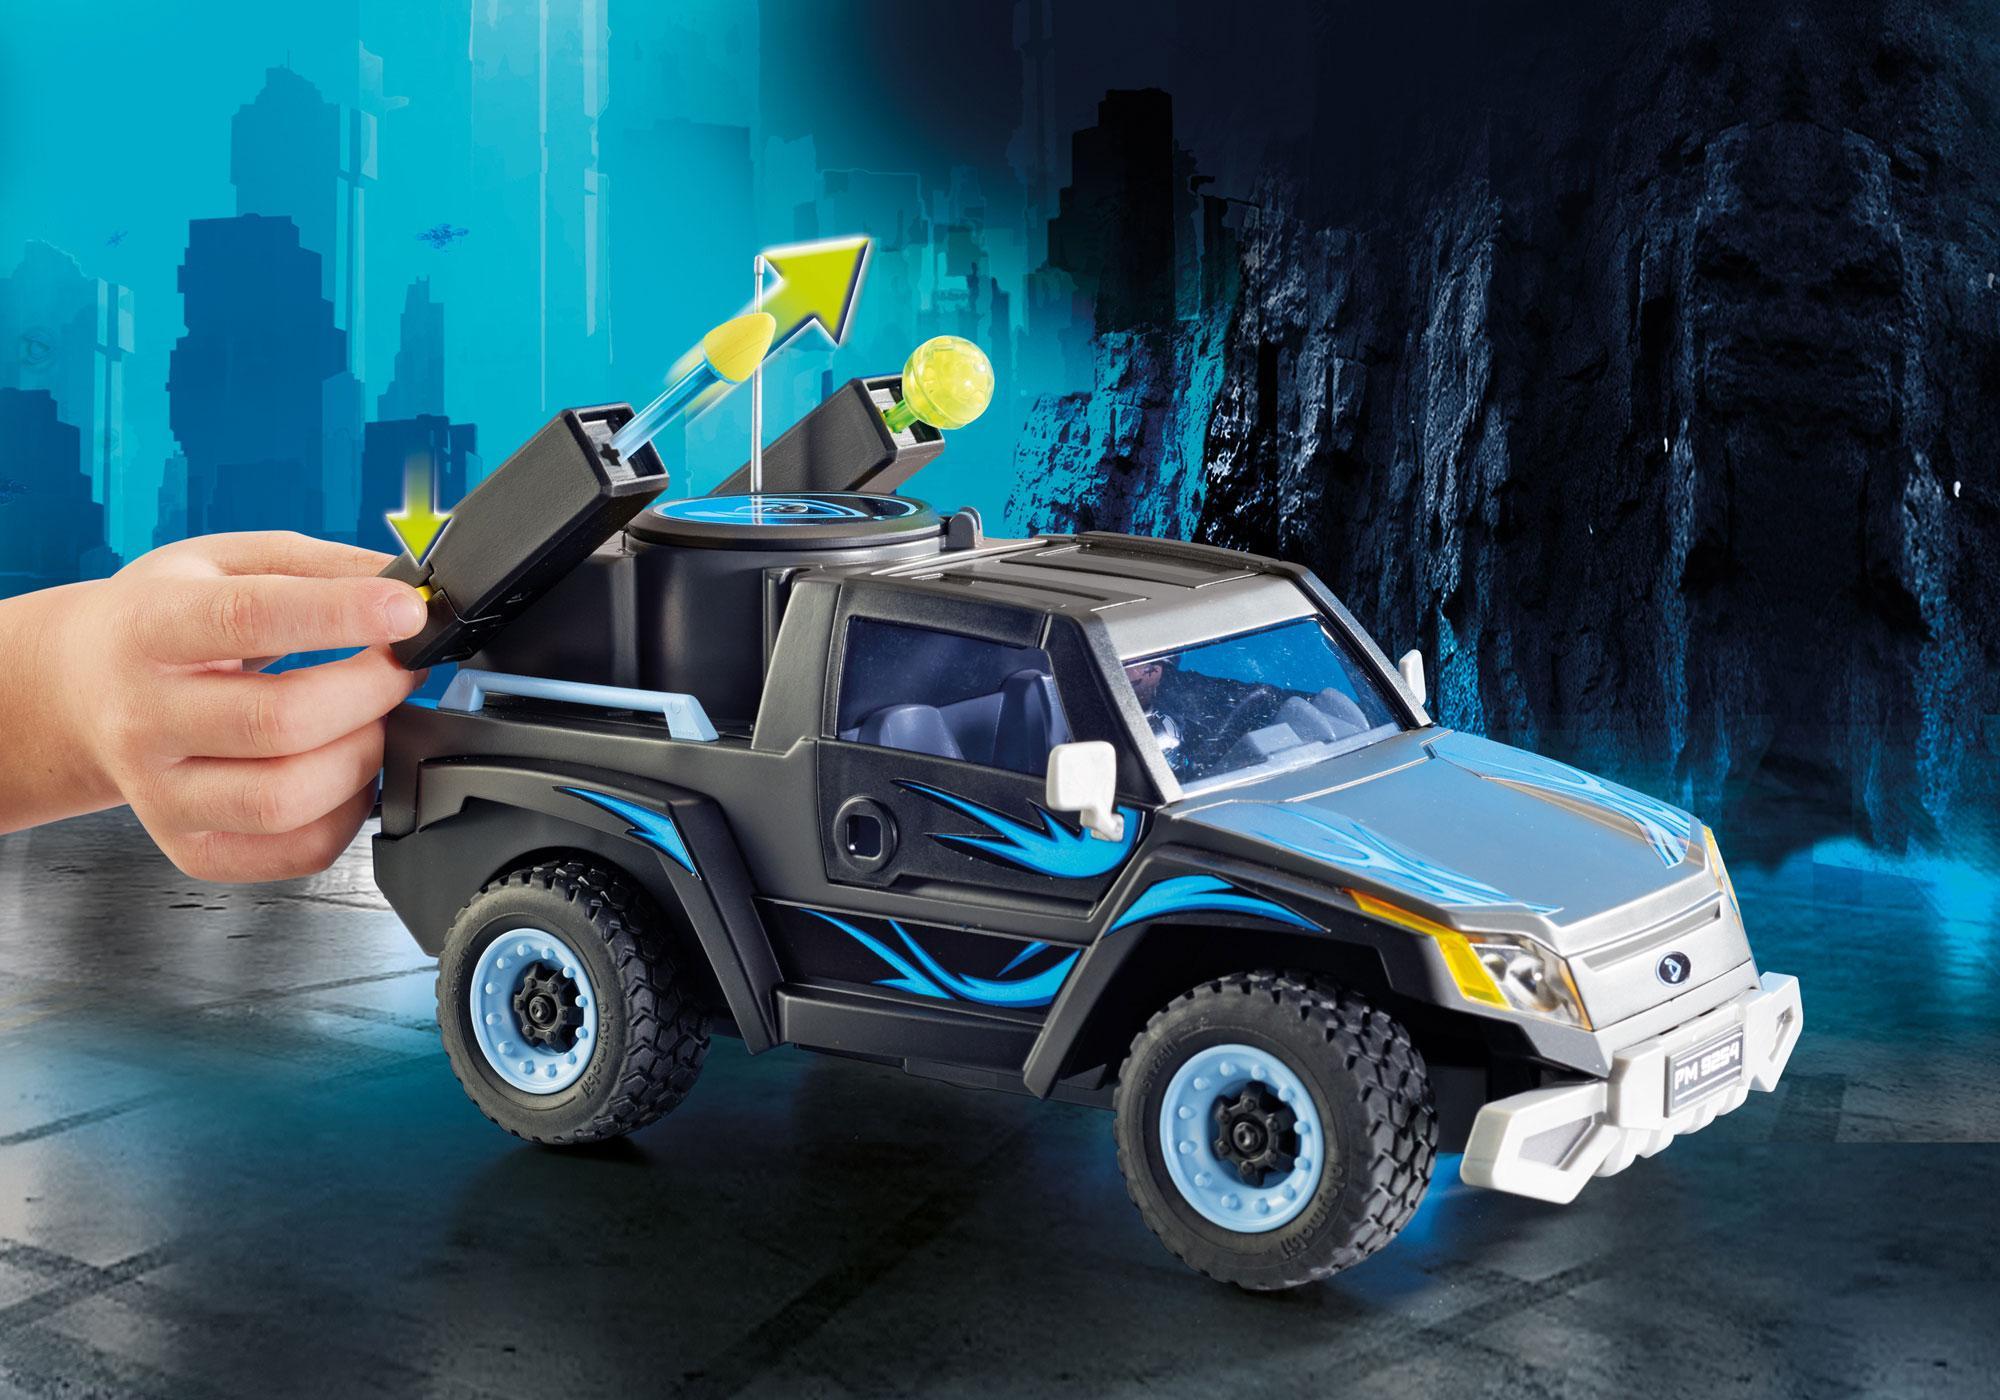 http://media.playmobil.com/i/playmobil/9254_product_extra1/Dr. Drone Pick-up